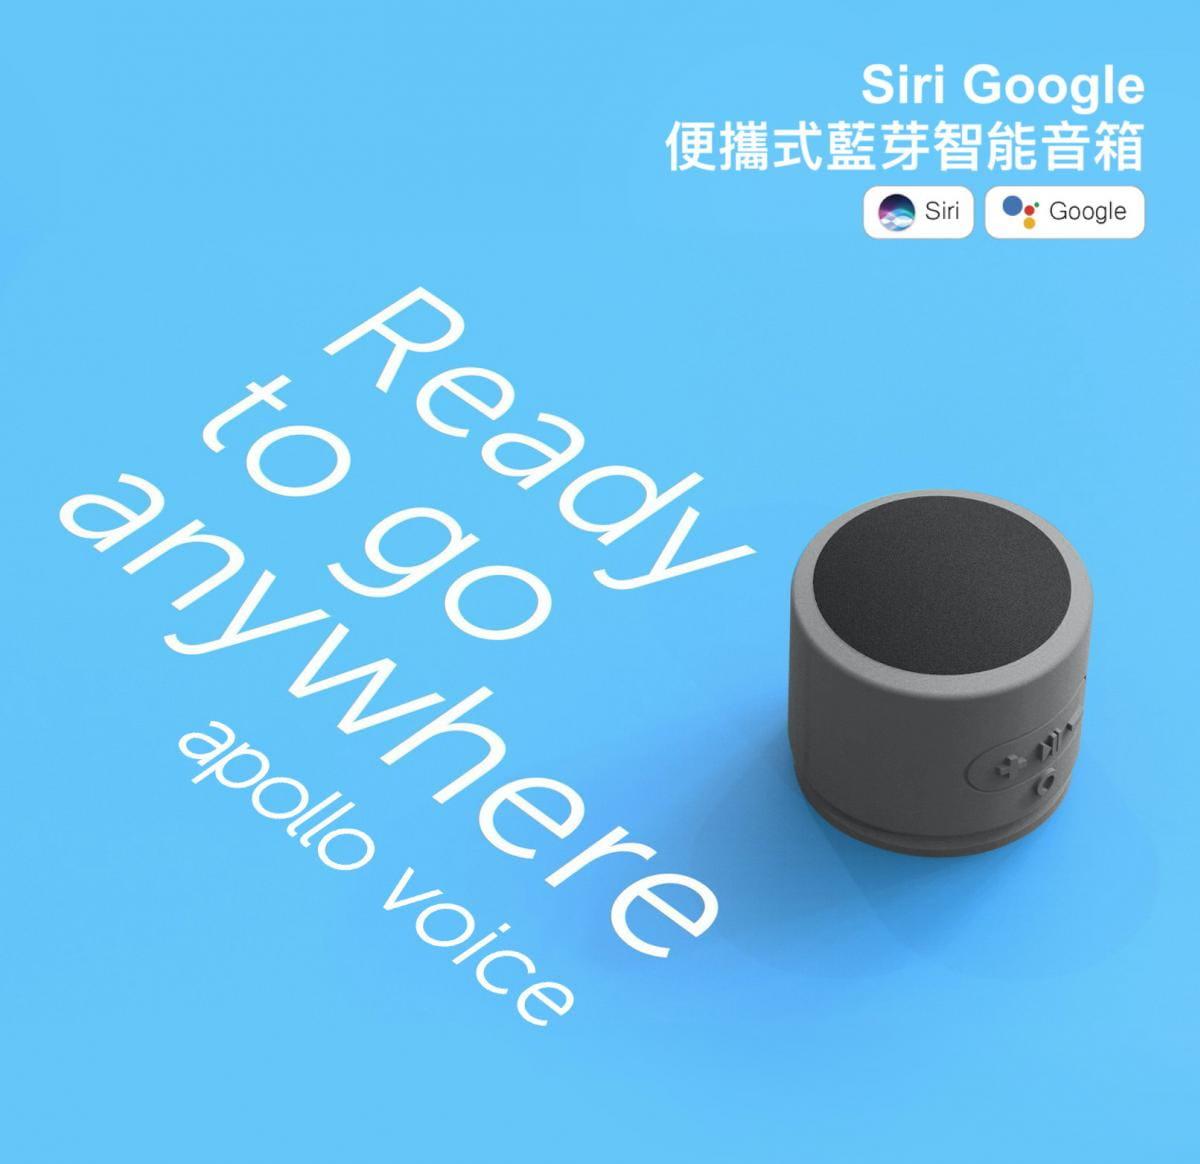 Addon Apollo Voice攜帶式Siri/Google藍芽智能音箱 0